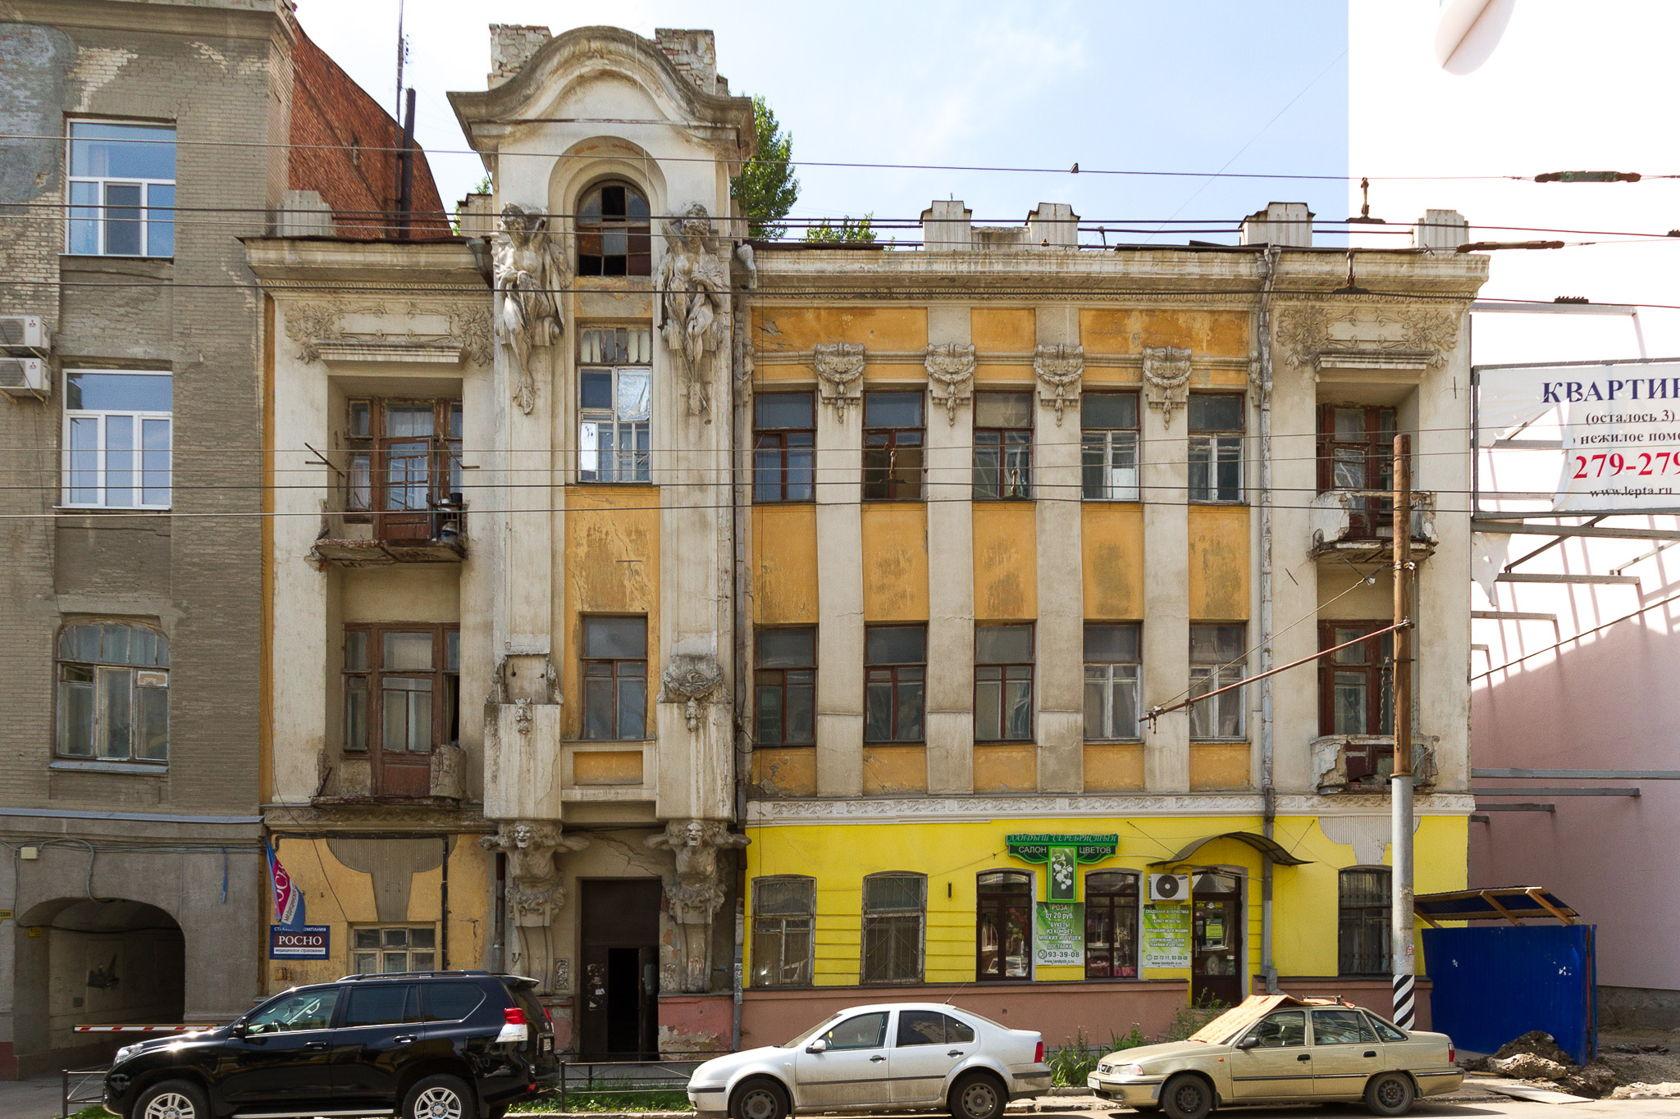 Картинки по запросу дом яхимовича